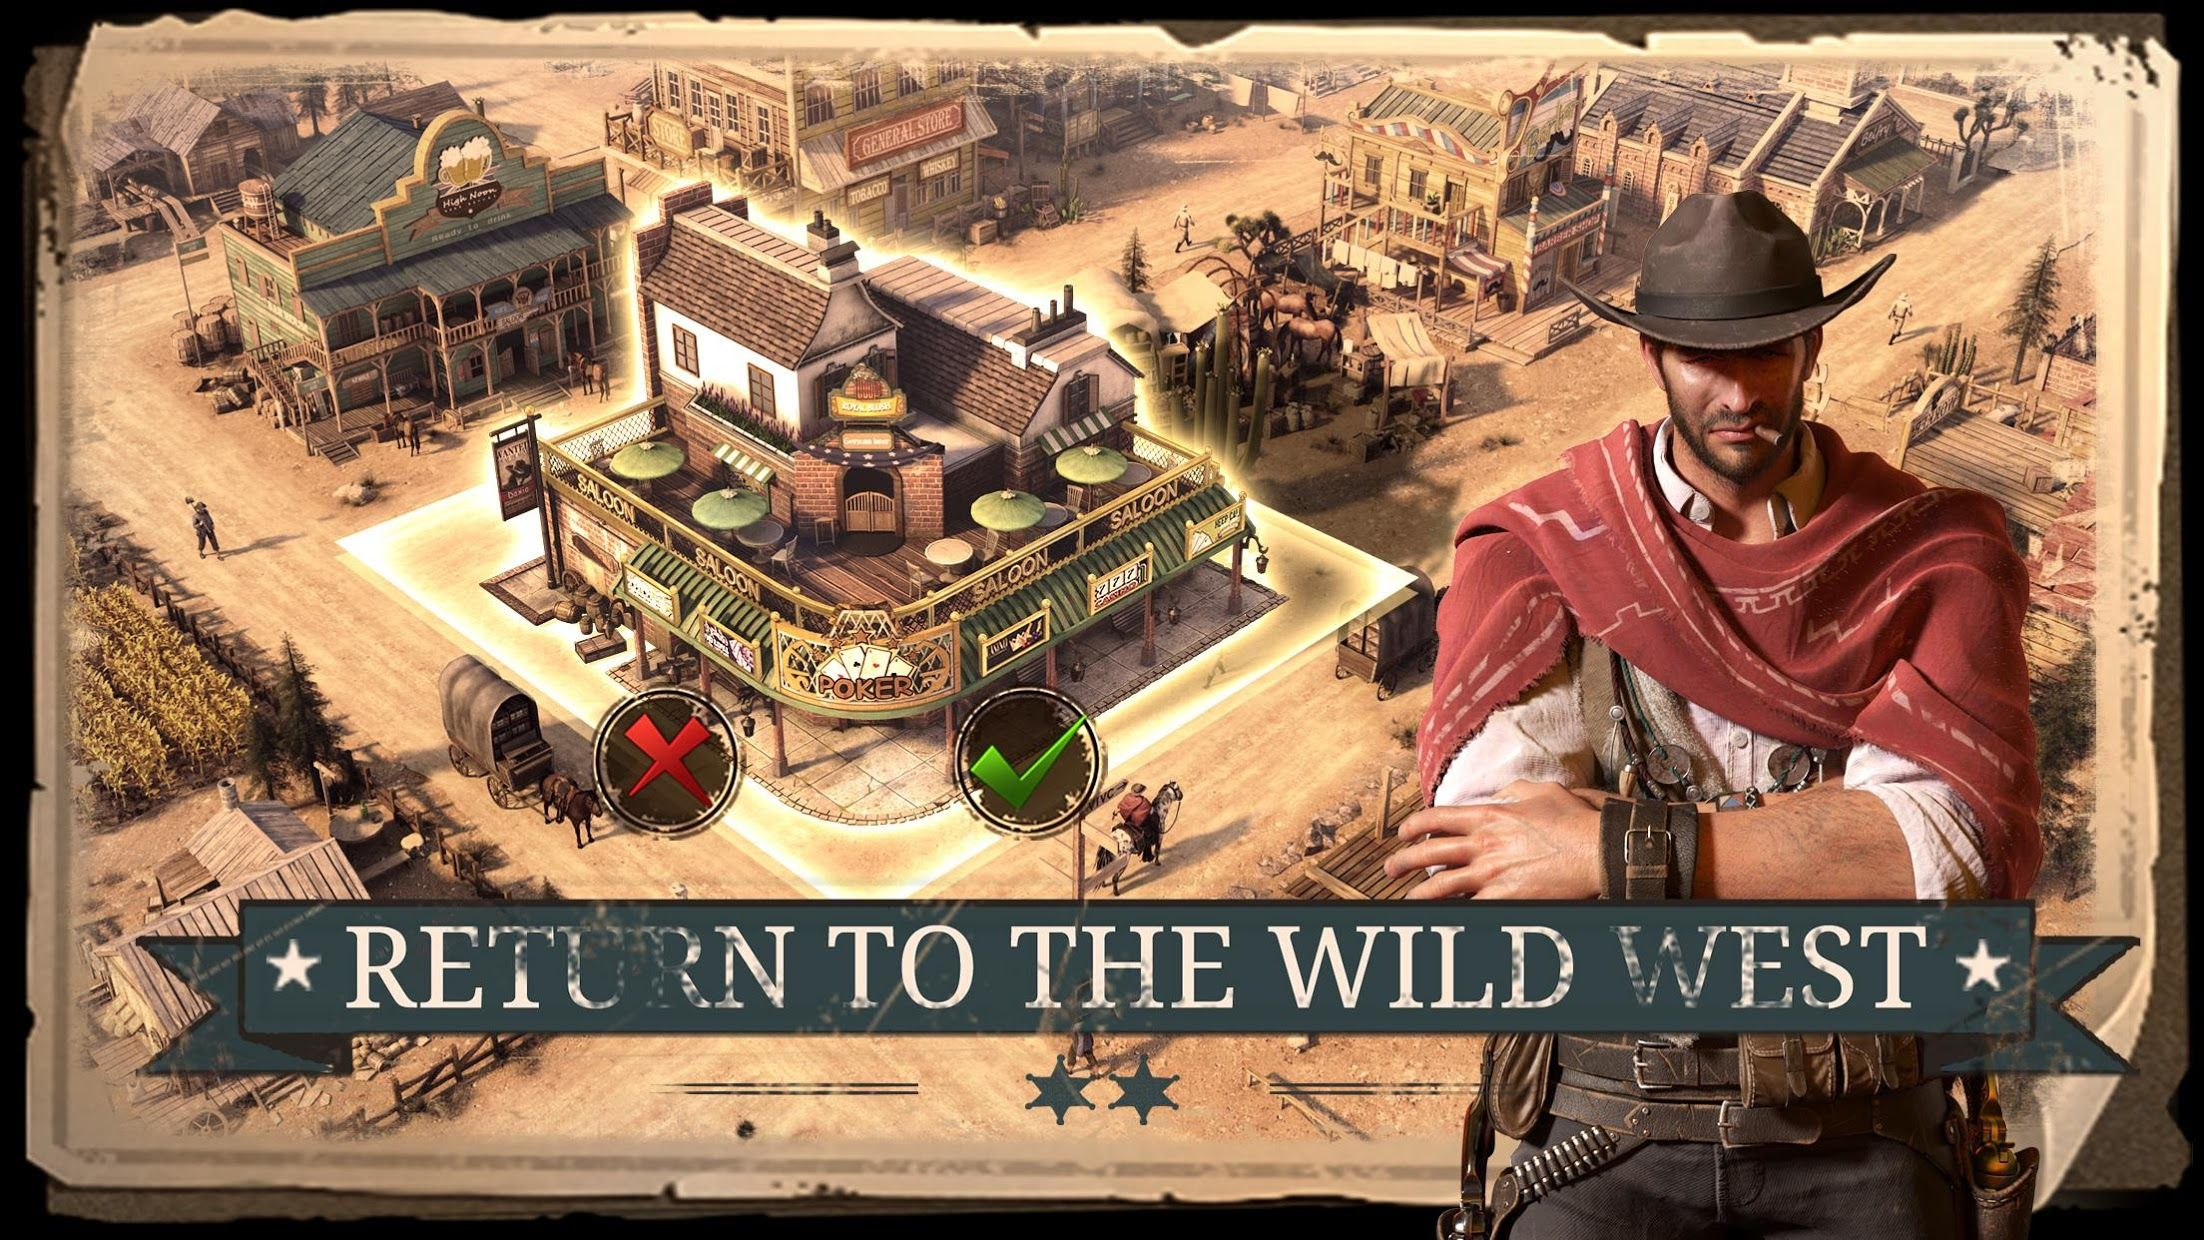 Frontier Justice-重返狂野西部! 游戏截图1